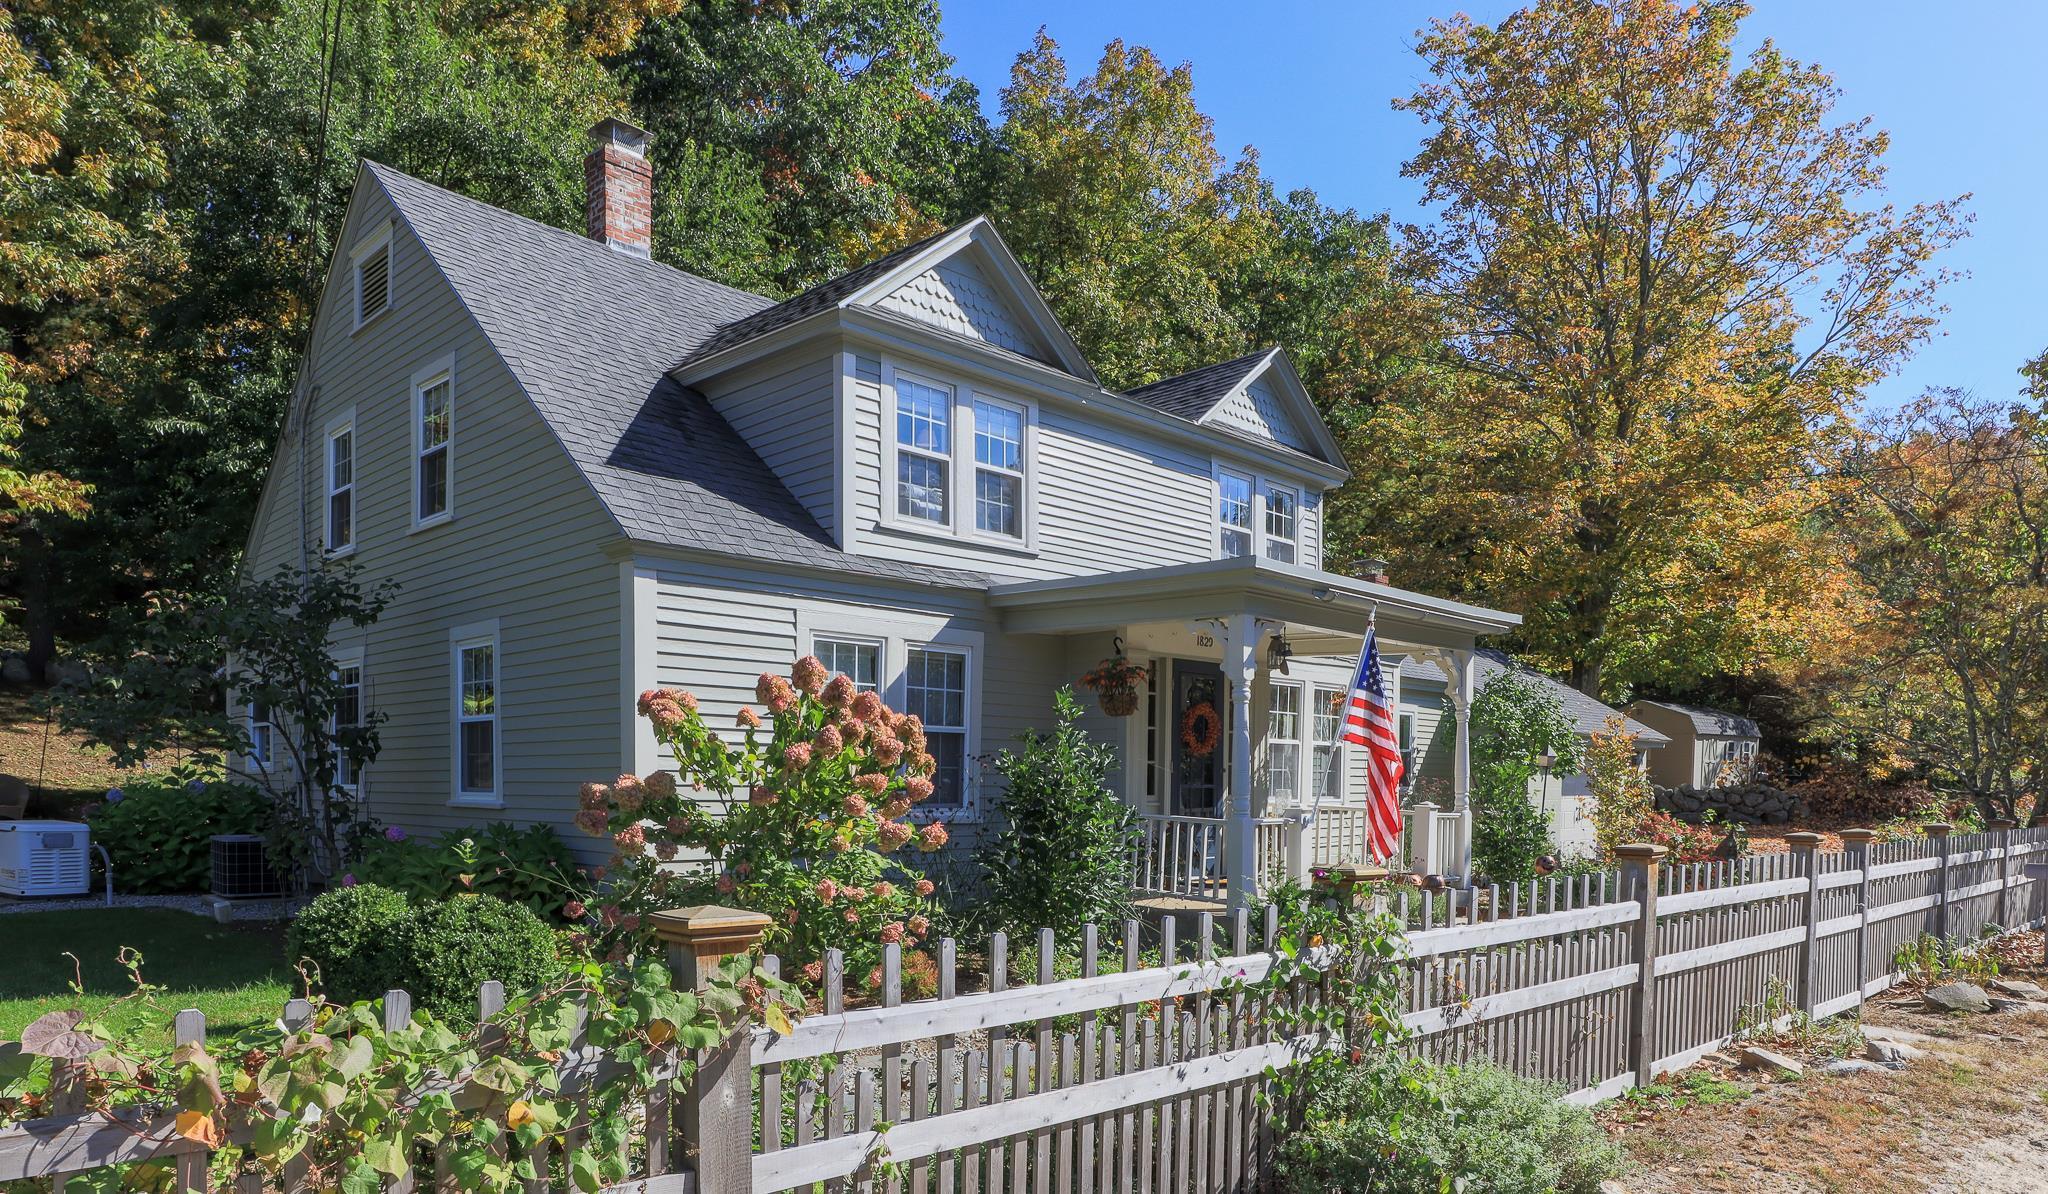 376 Boston Post Road, Amherst, NH 03031